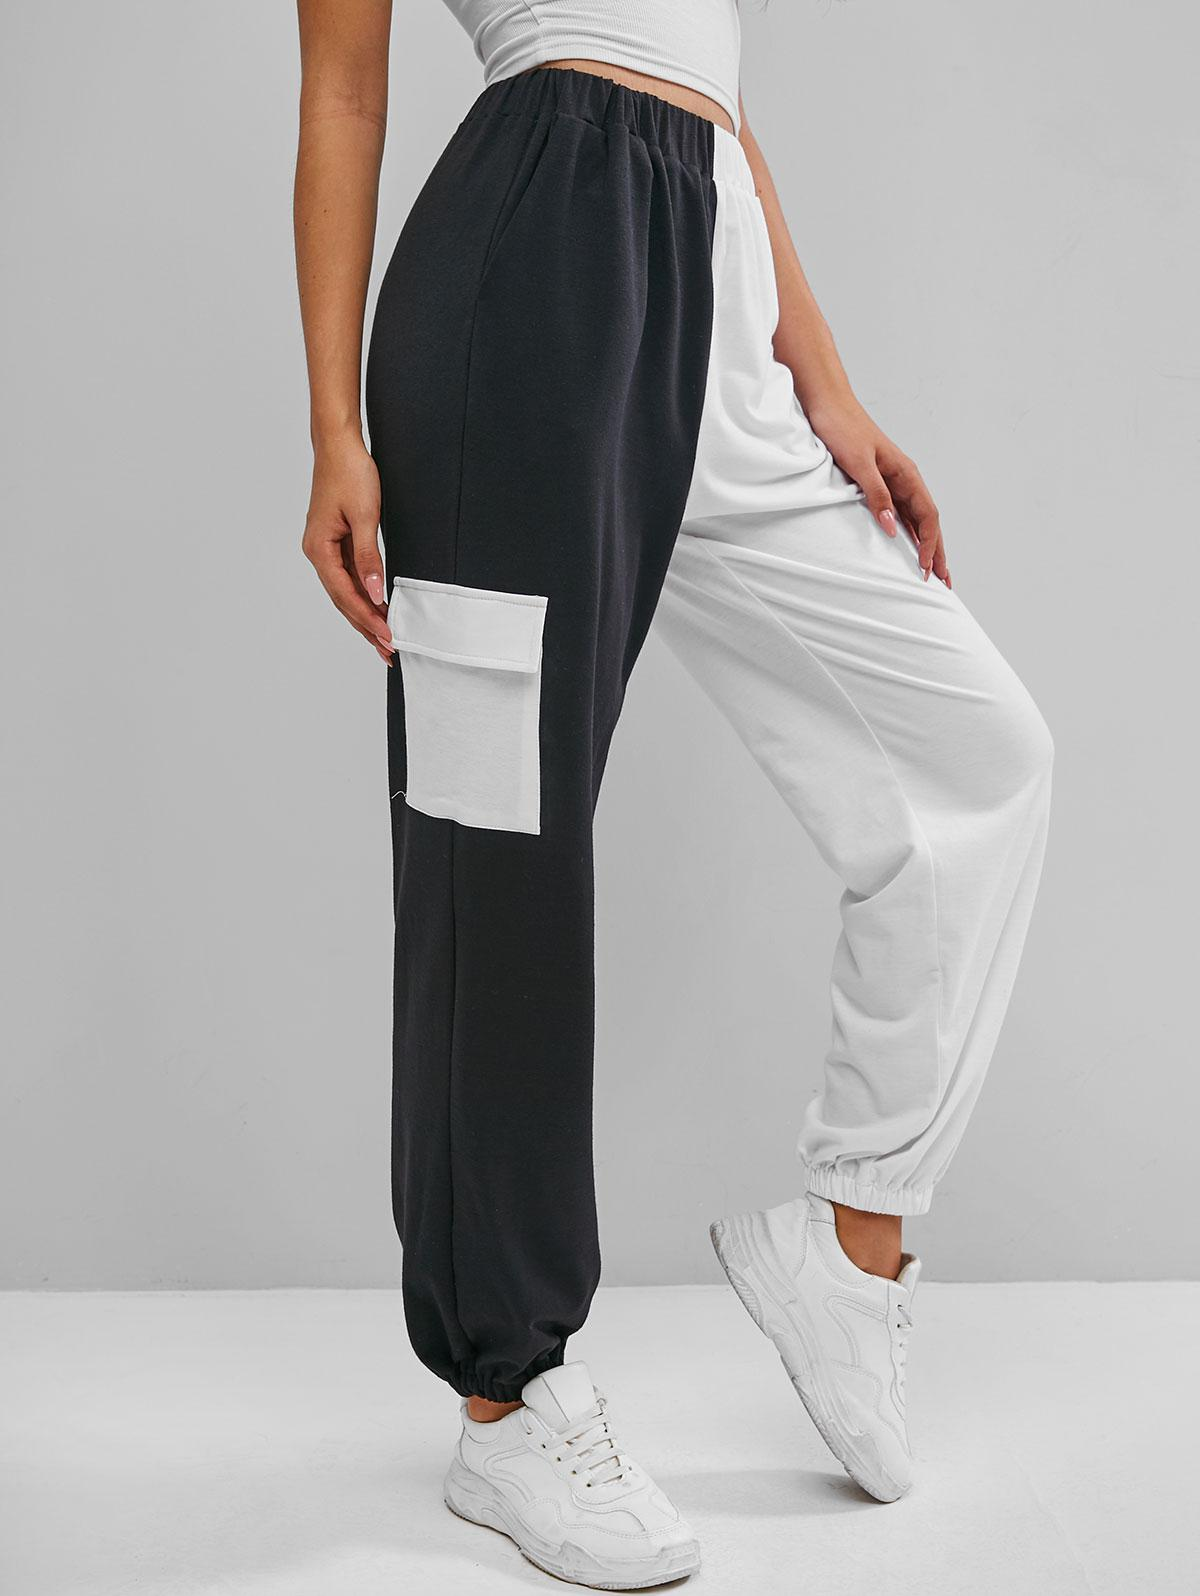 ZAFUL Pocket Bicolor High Waisted Jogger Pants